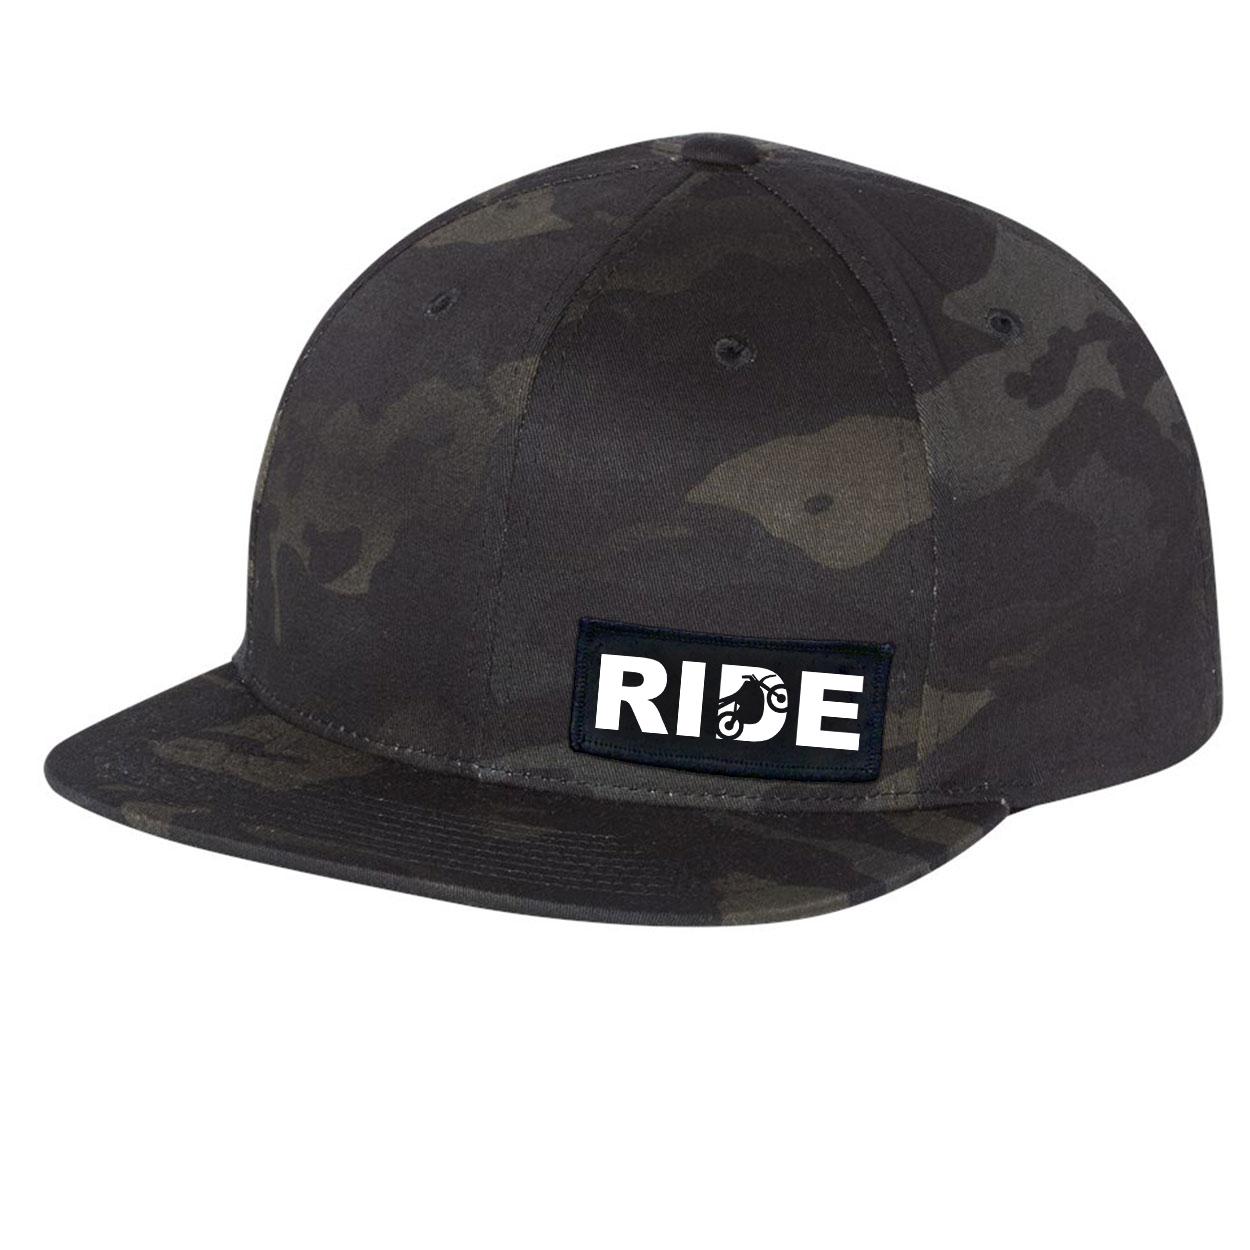 Ride Moto Logo Night Out Woven Patch Flat Brim Snapback Hat Black Camo (White Logo)